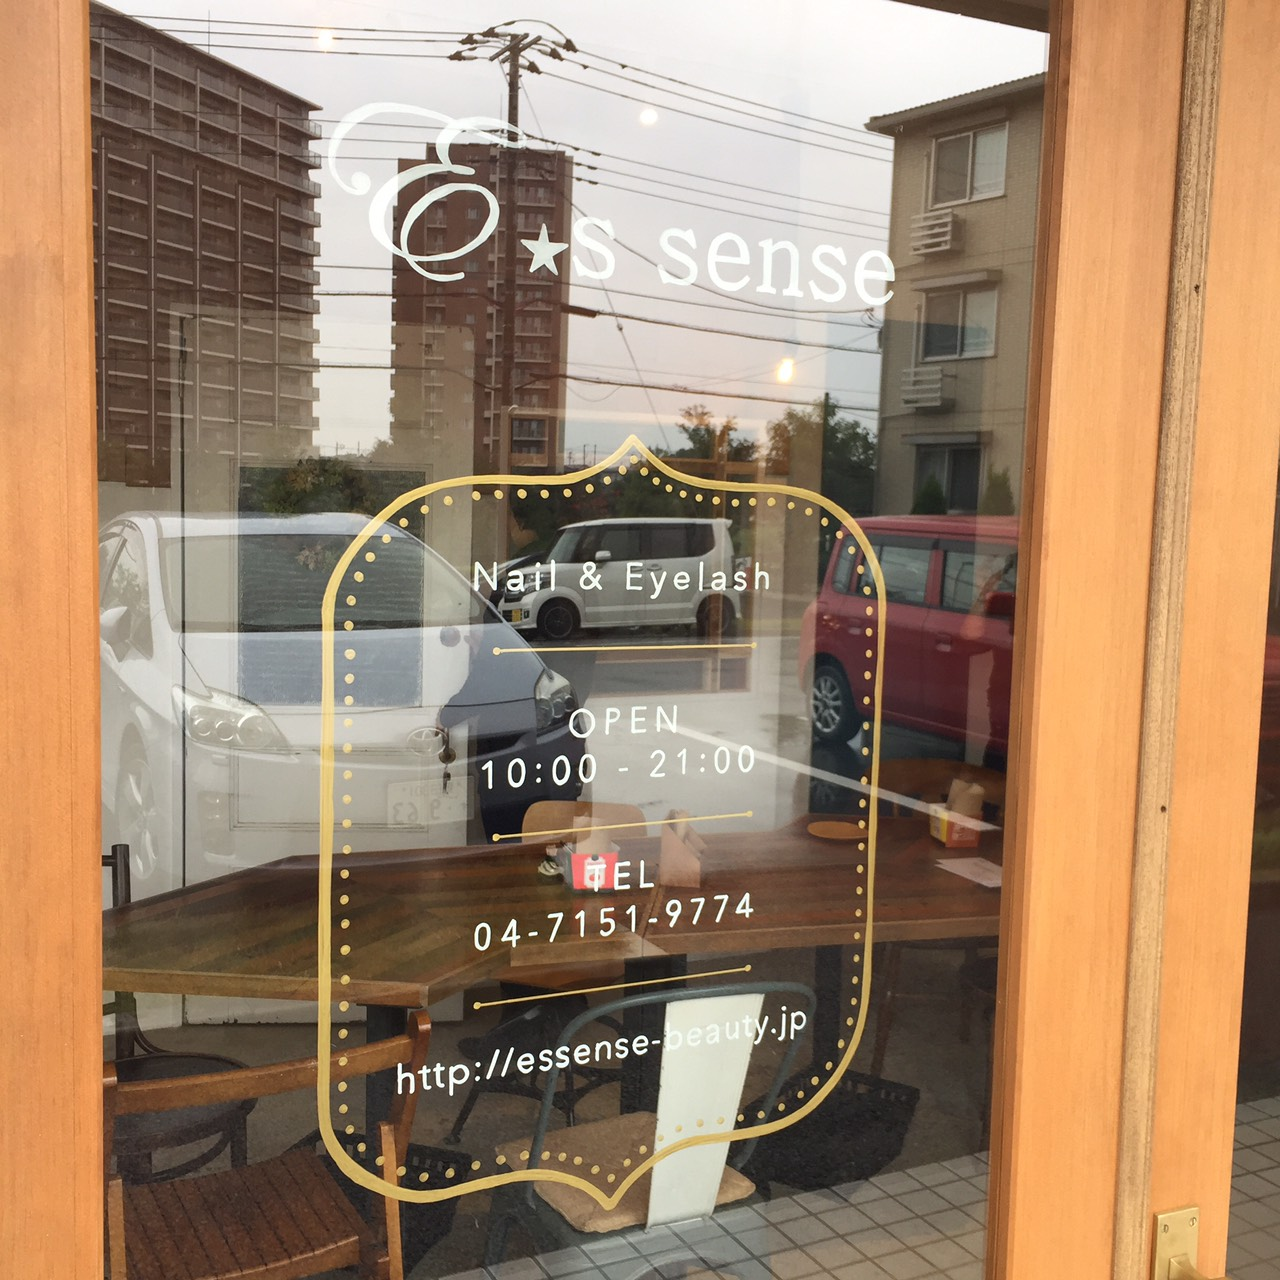 E's sense 窓サイン